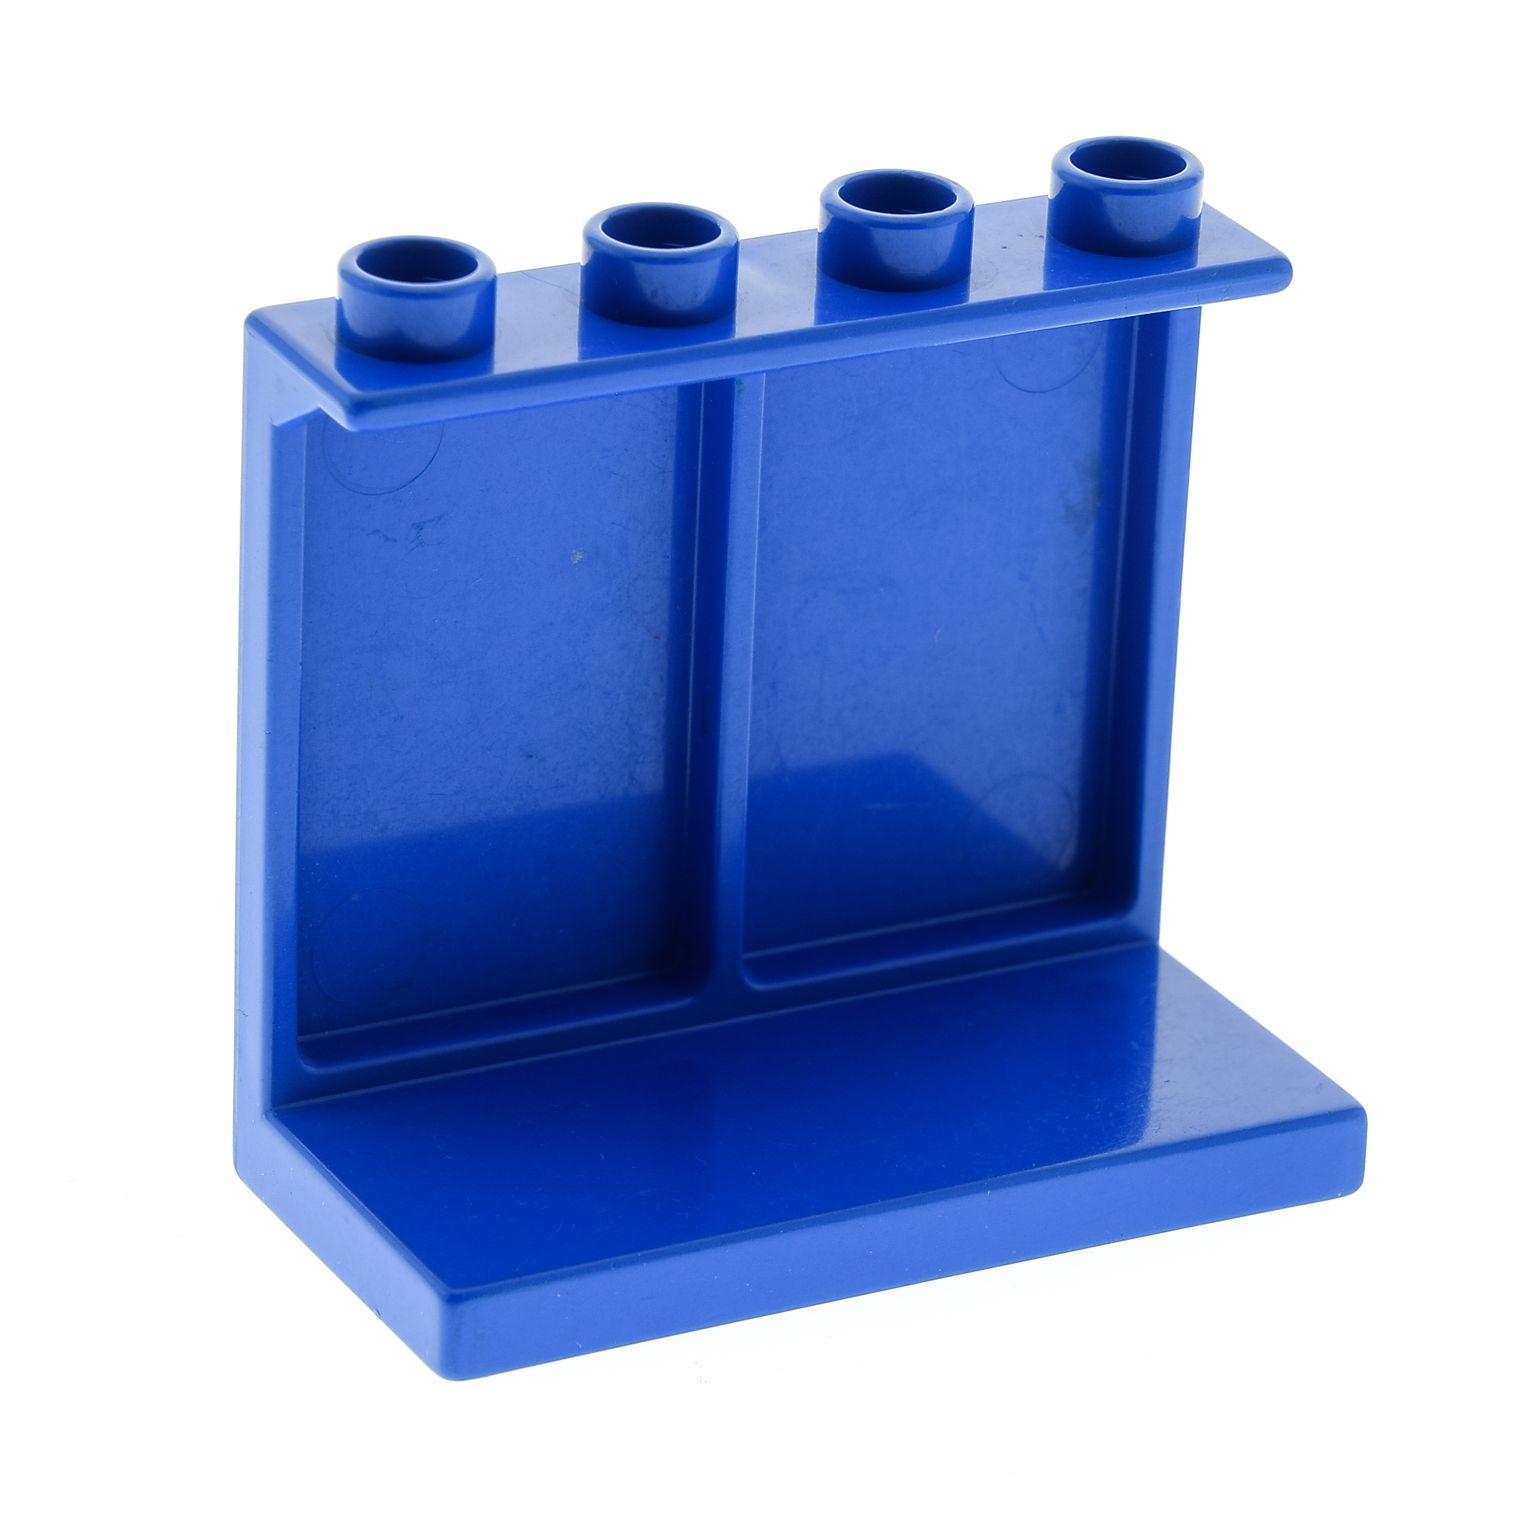 1 x lego duplo m bel regal blau 4x2x2 b cher waren panele. Black Bedroom Furniture Sets. Home Design Ideas